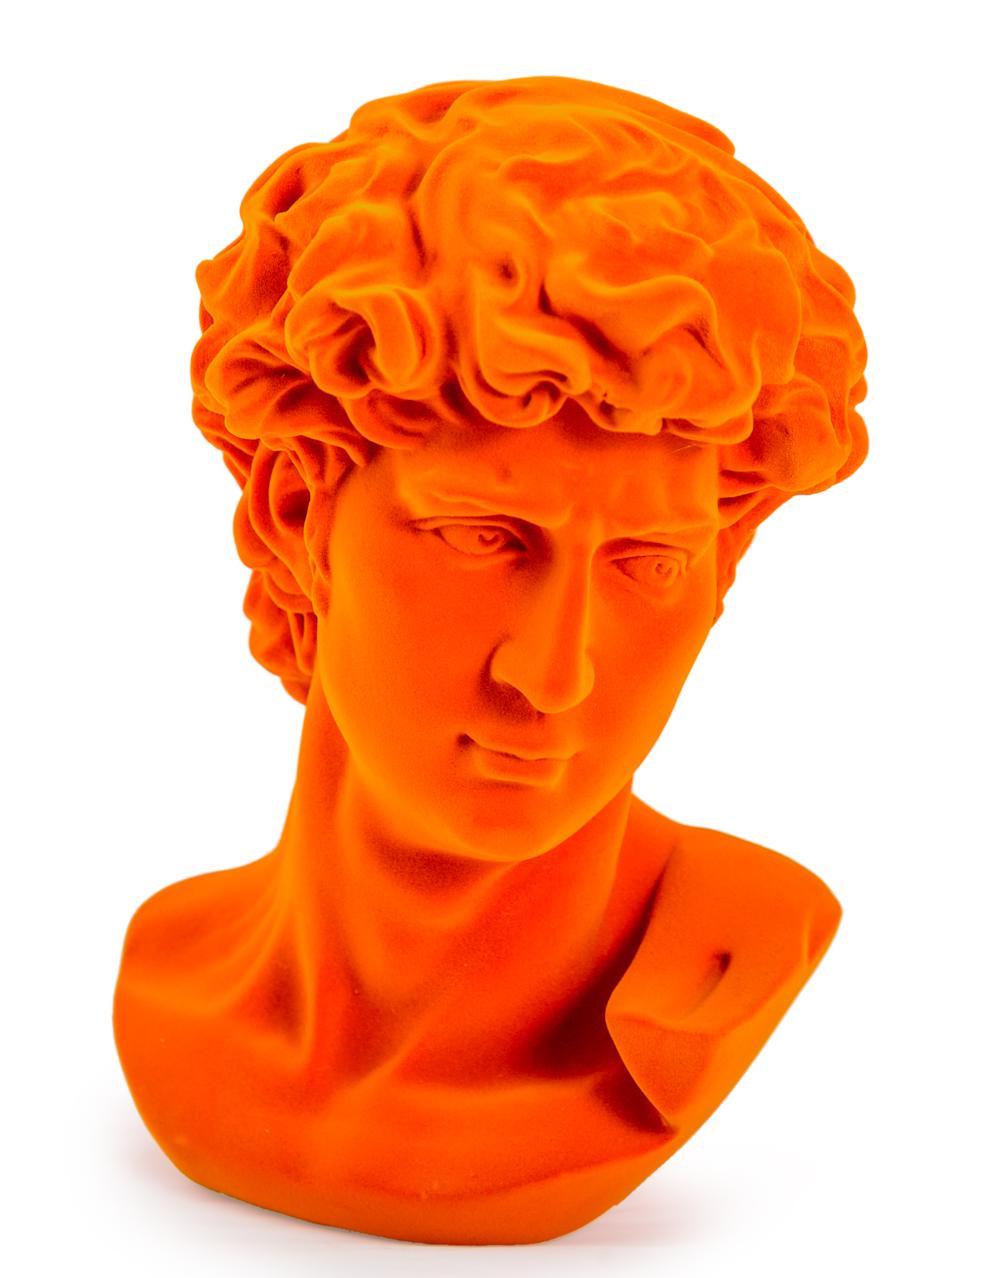 Flock David Bust Orange